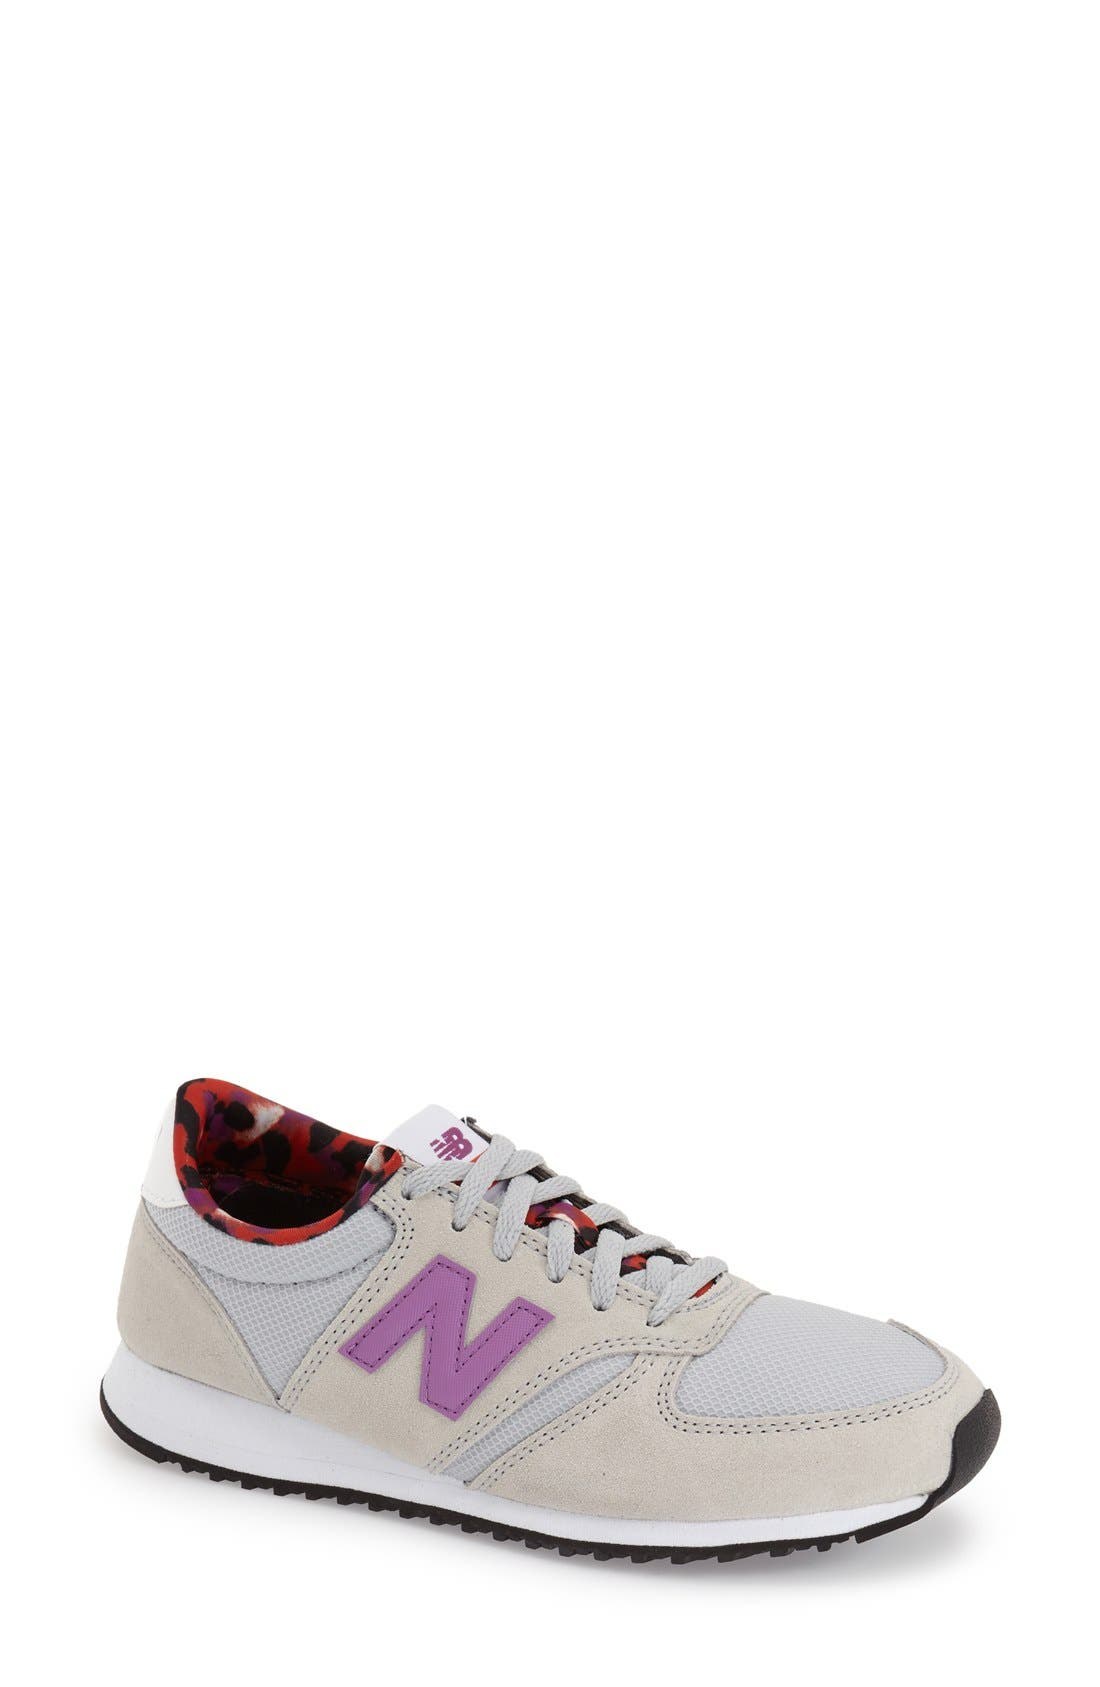 Main Image - New Balance '420' Sneaker (Women)